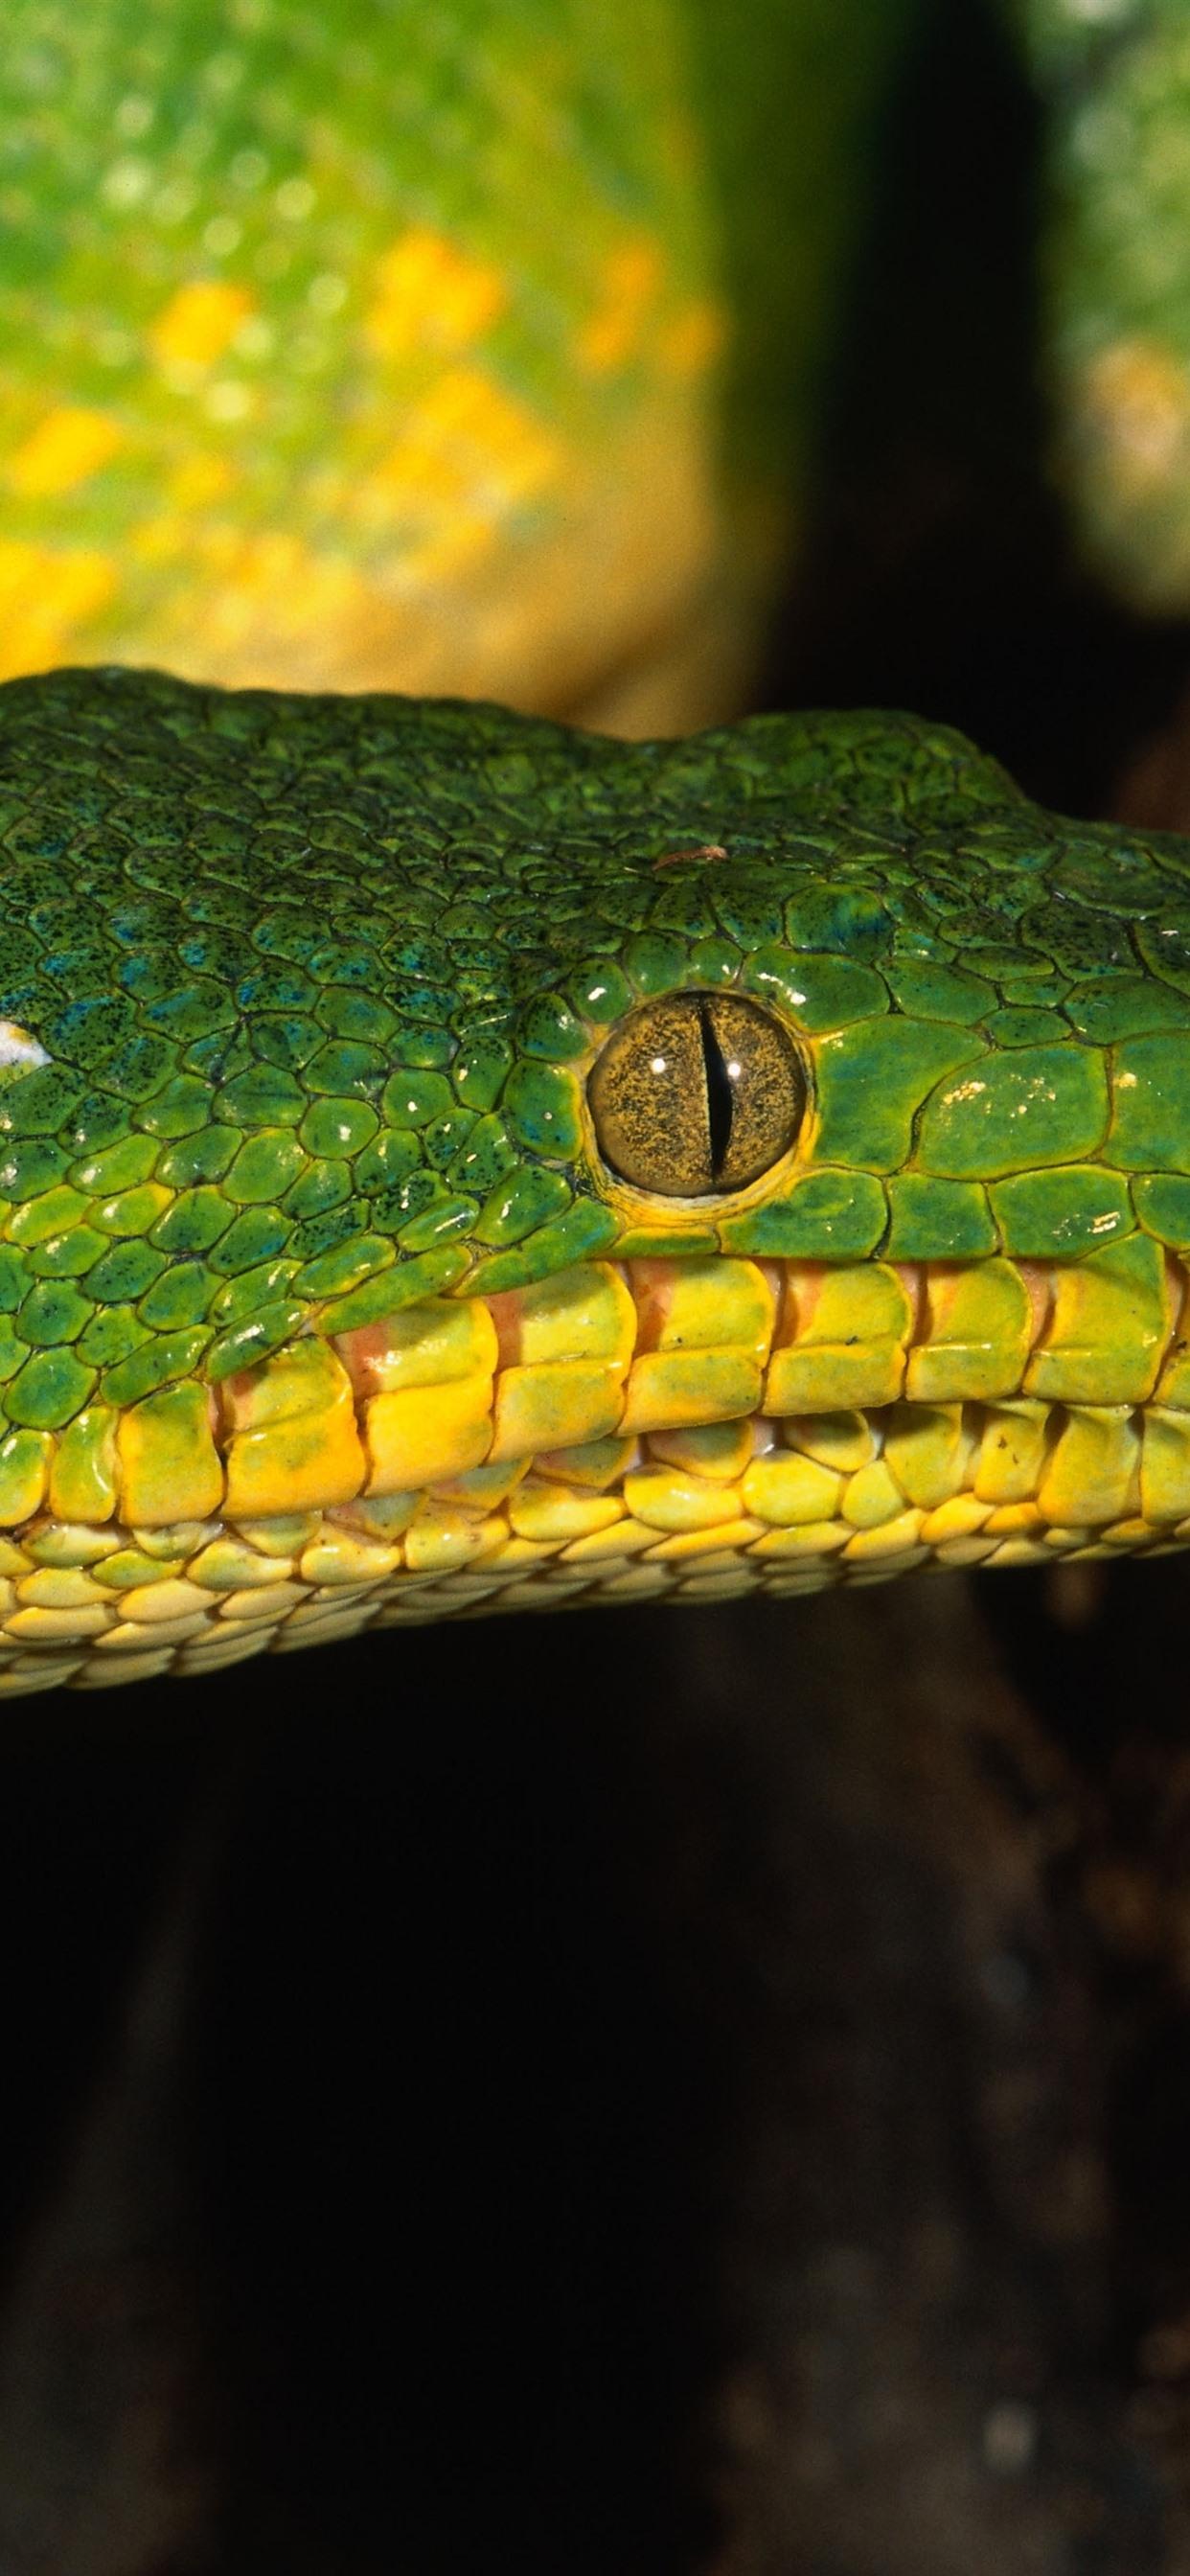 Green Snake Head Eye 1242x2688 Iphone Xs Max Wallpaper